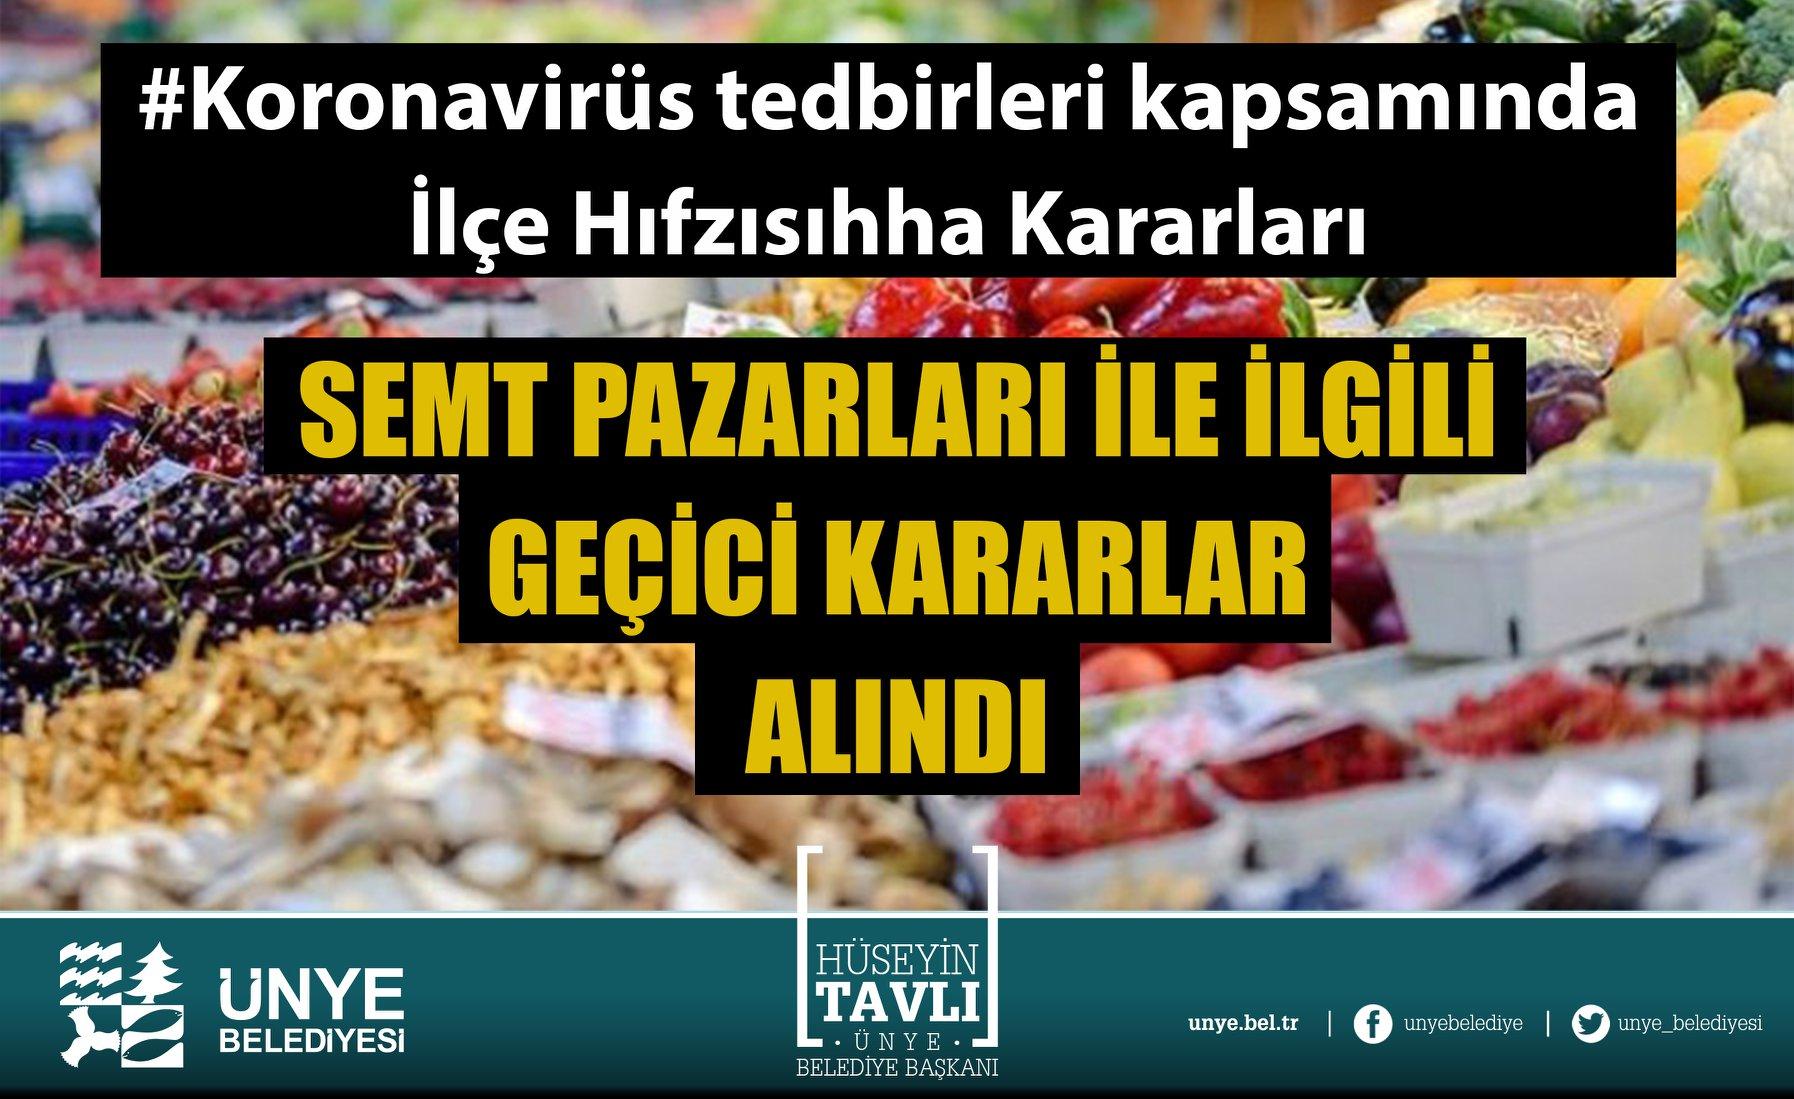 ÜNYE'DE SEMT PAZARLARINA KORONAVİRÜS ENGELİ